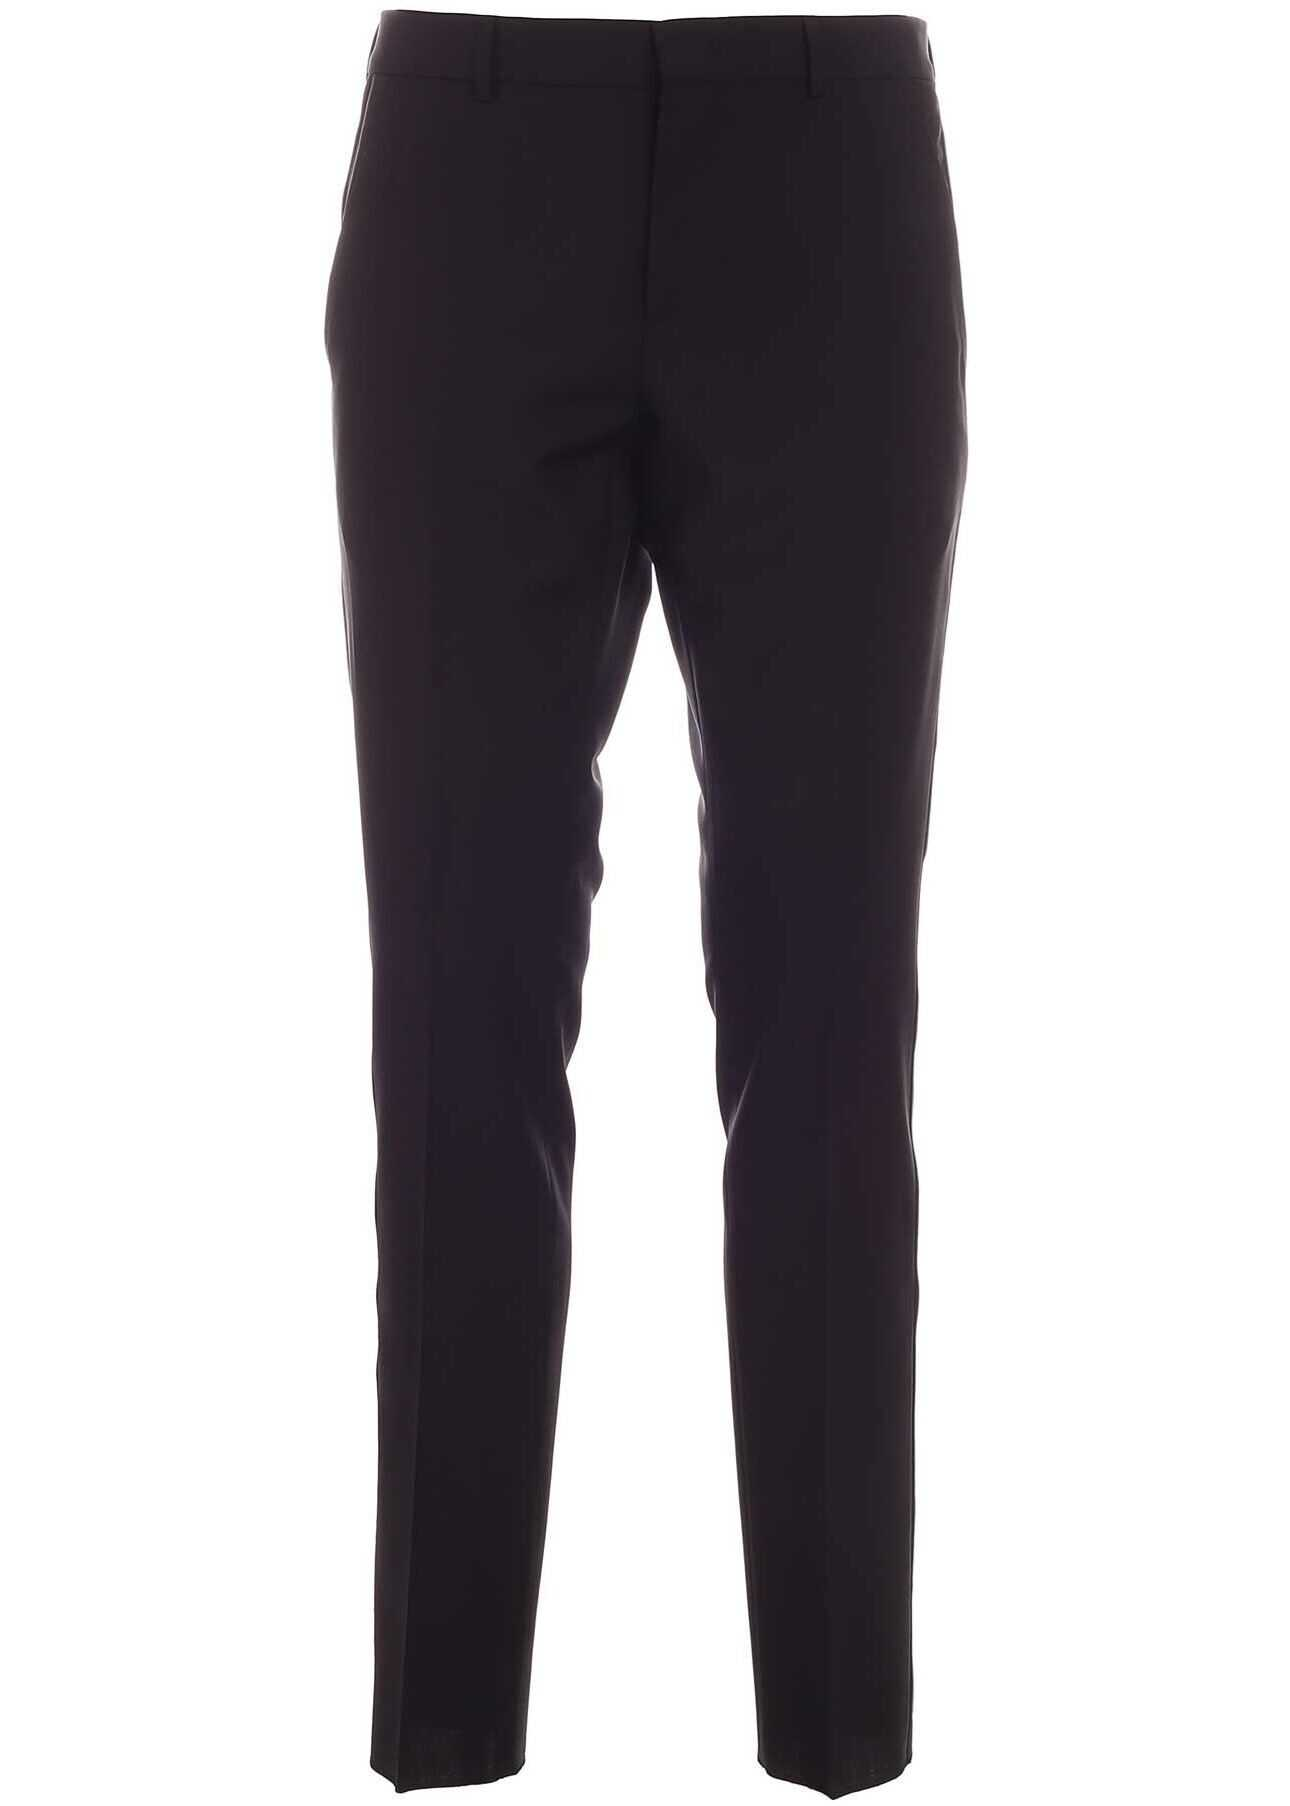 Valentino Garavani Mohair And Wool Pants In Black Black imagine